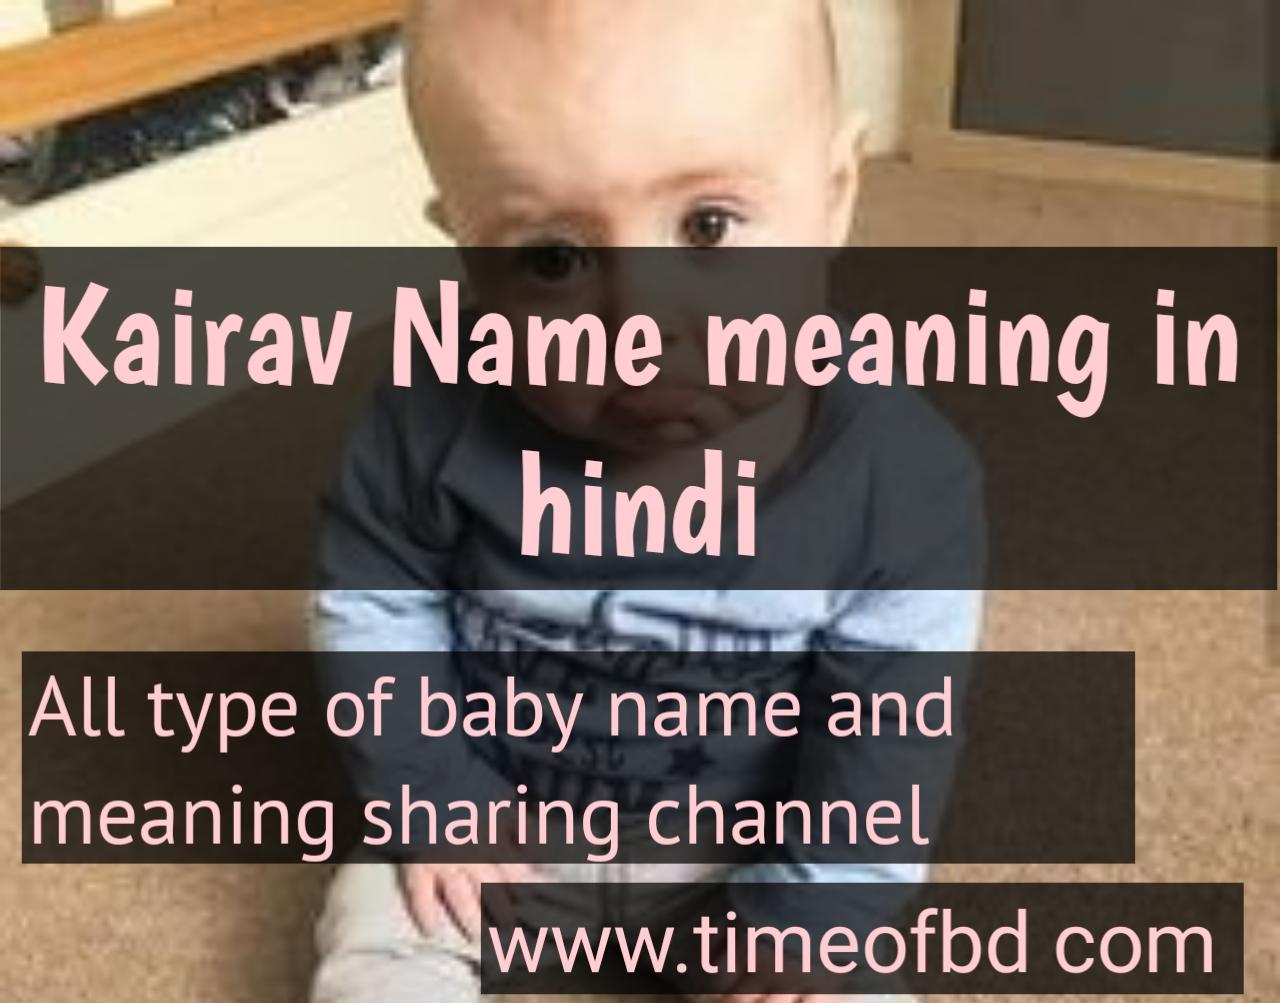 kairav name meaning in hindi, kairav ka meaning ,kairav meaning in hindi dictioanry,meaning of kairav in hindi